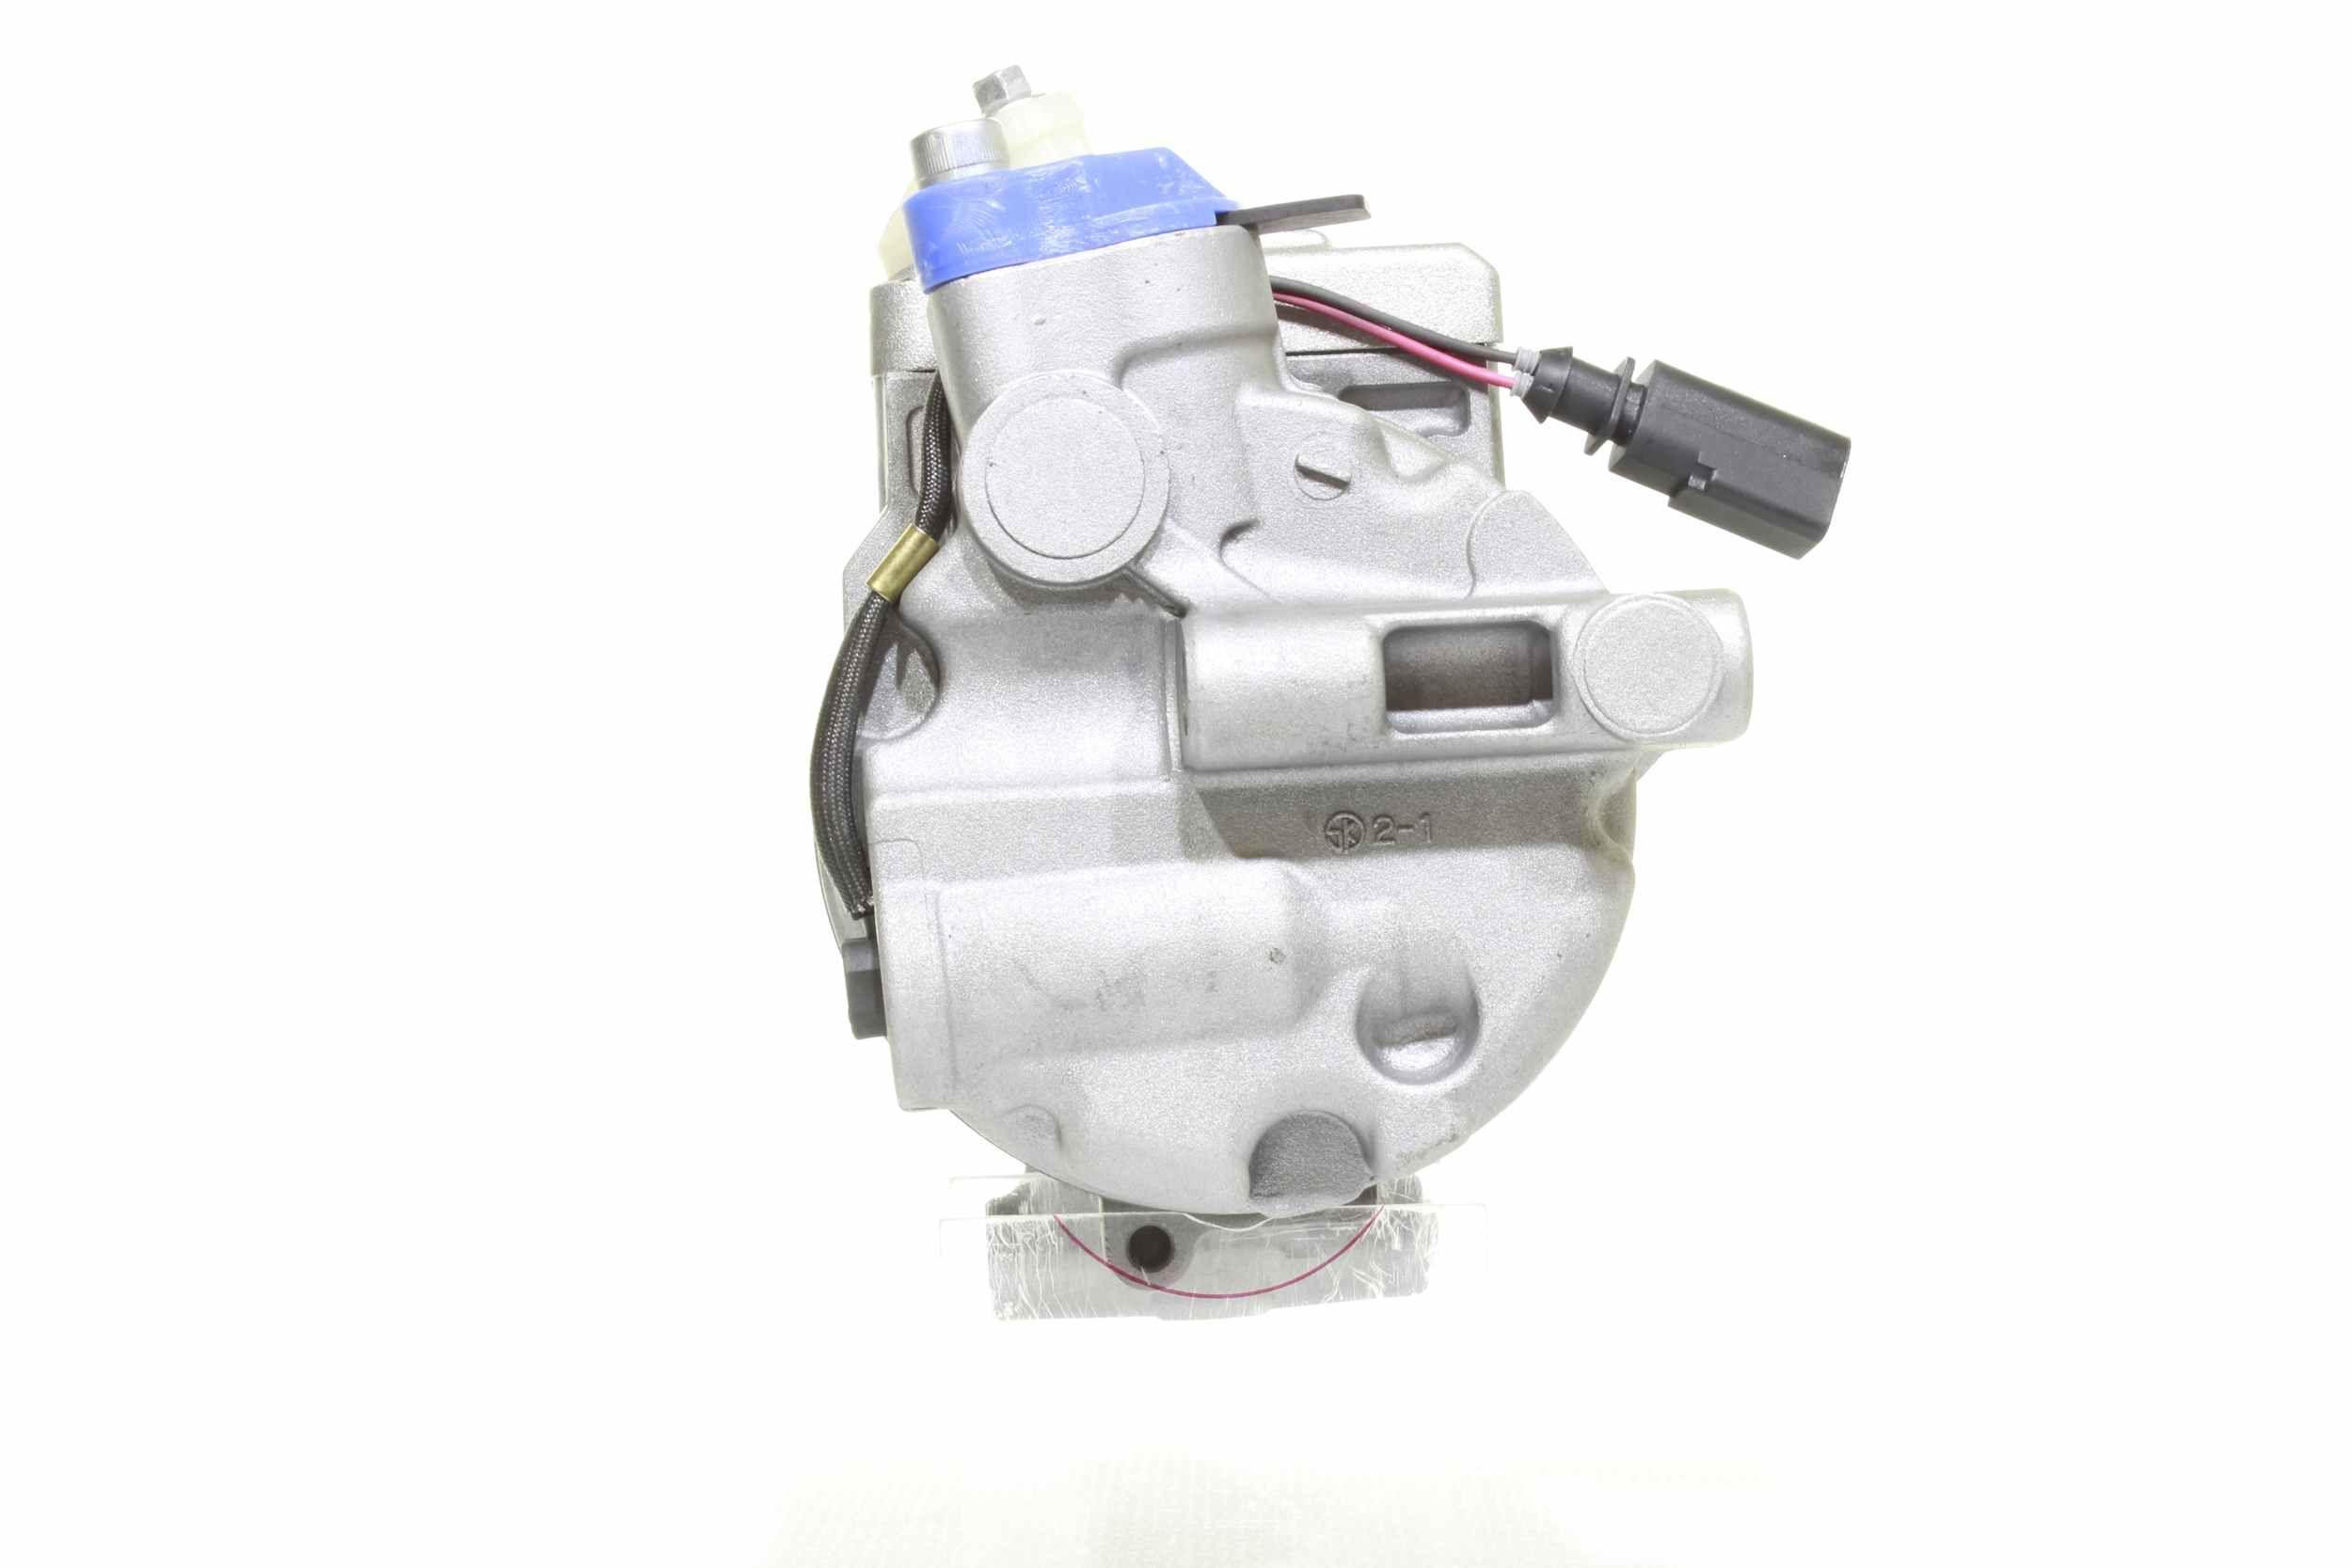 10550934 Kompressor, Klimaanlage ALANKO 550934 - Große Auswahl - stark reduziert